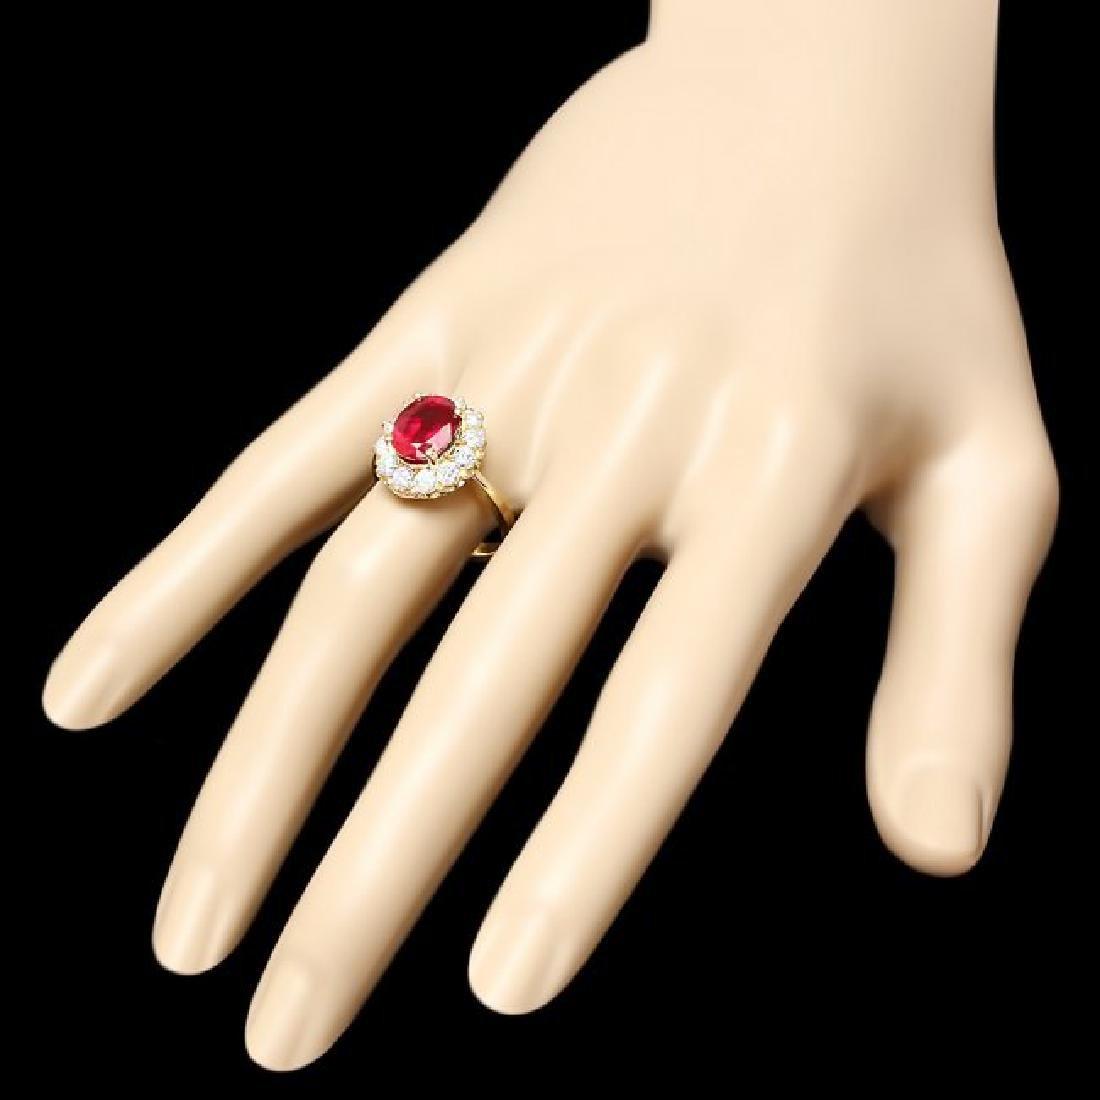 14k Yellow Gold 3.61ct Ruby 1.05ct Diamond Ring - 3